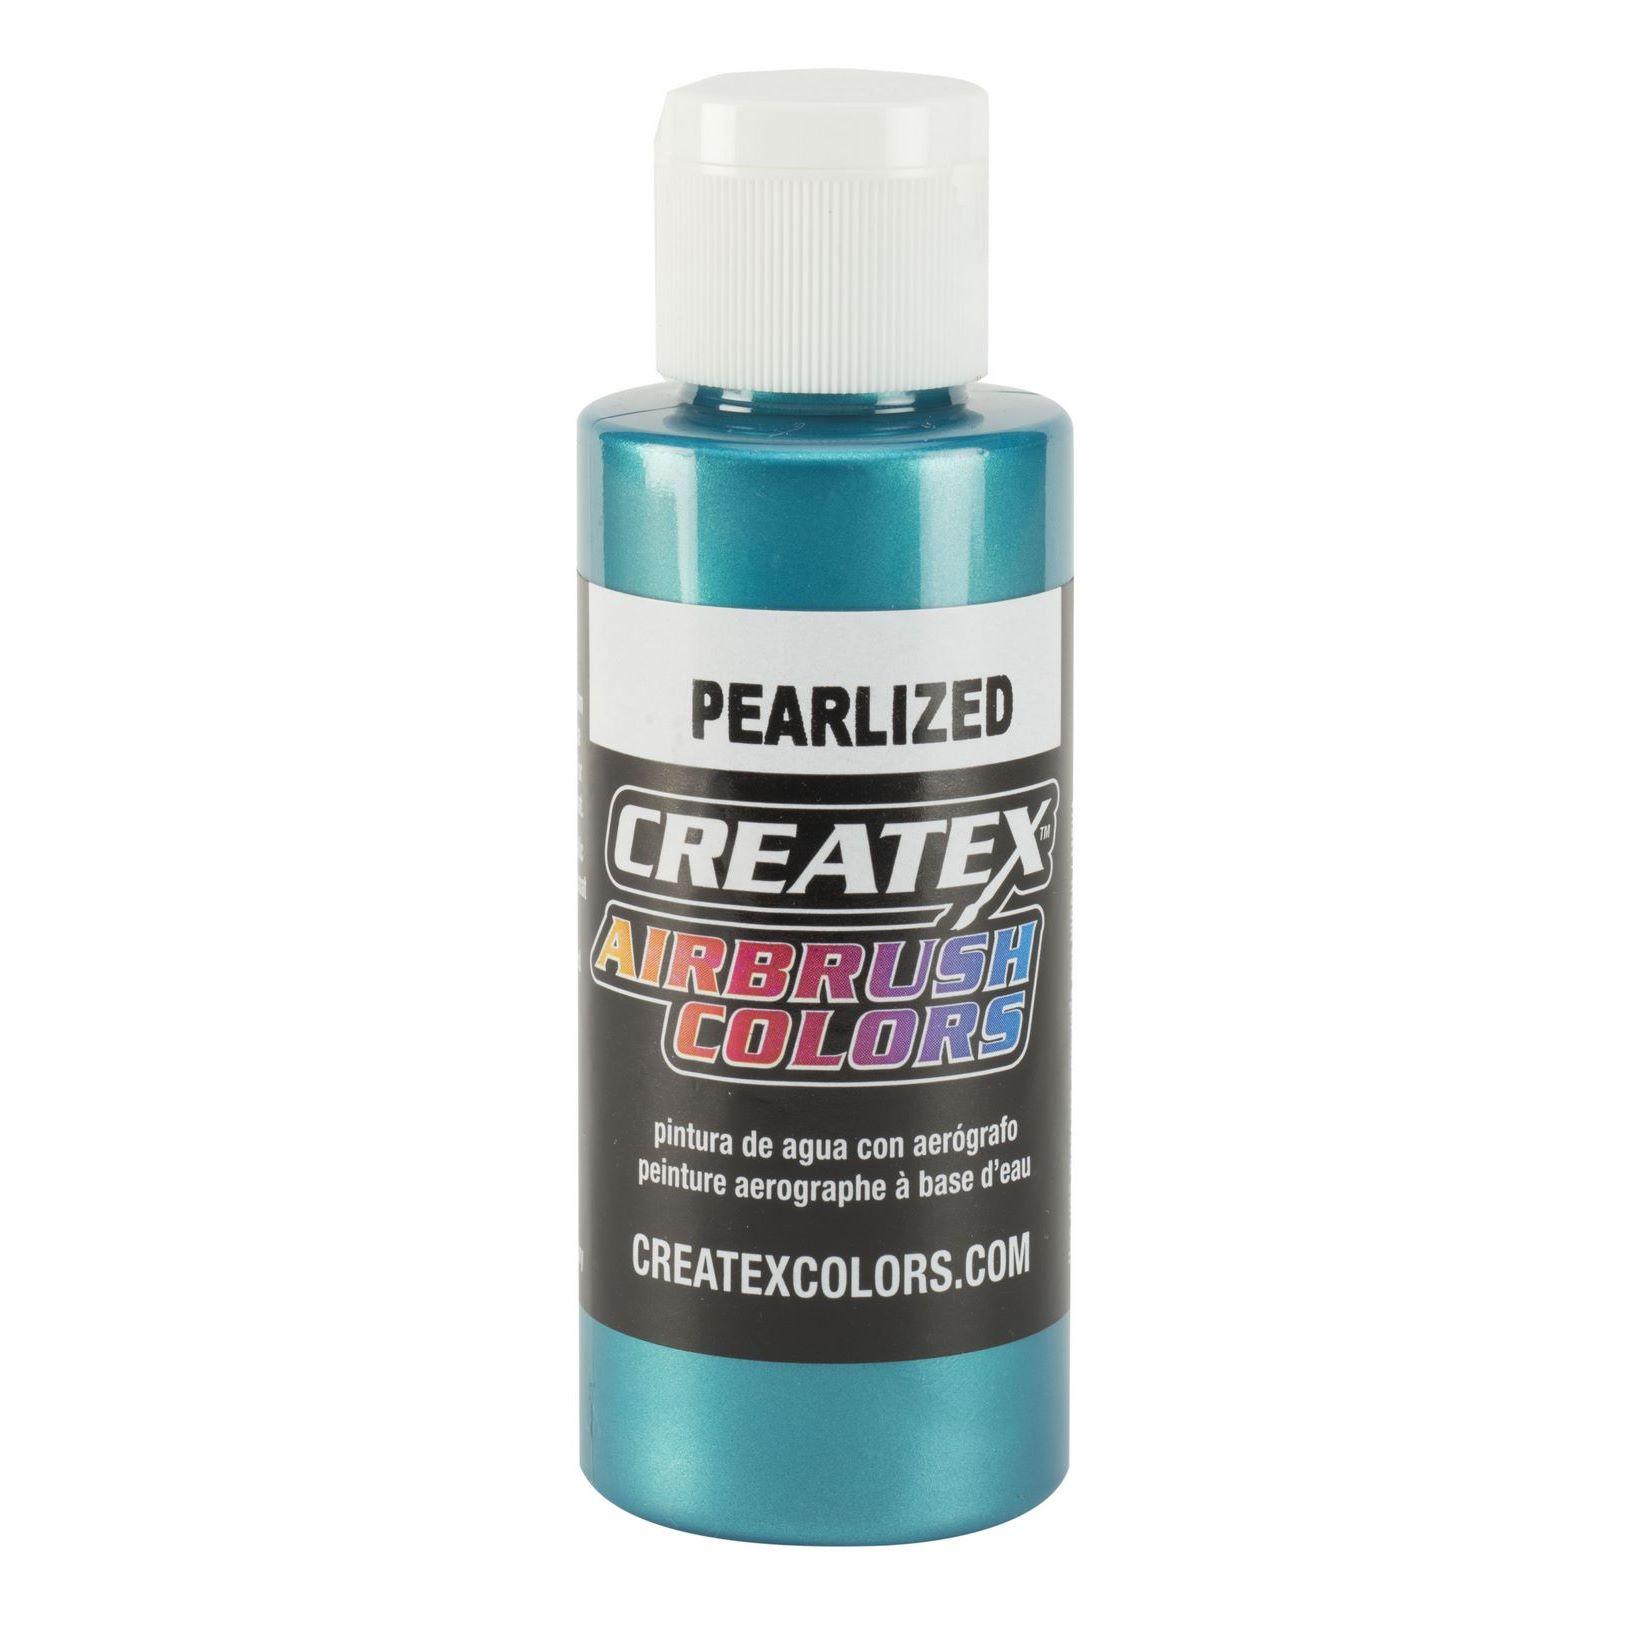 pearl Türkis Createx Airbrush Colors Farbe 120ml 12 5303 Createx